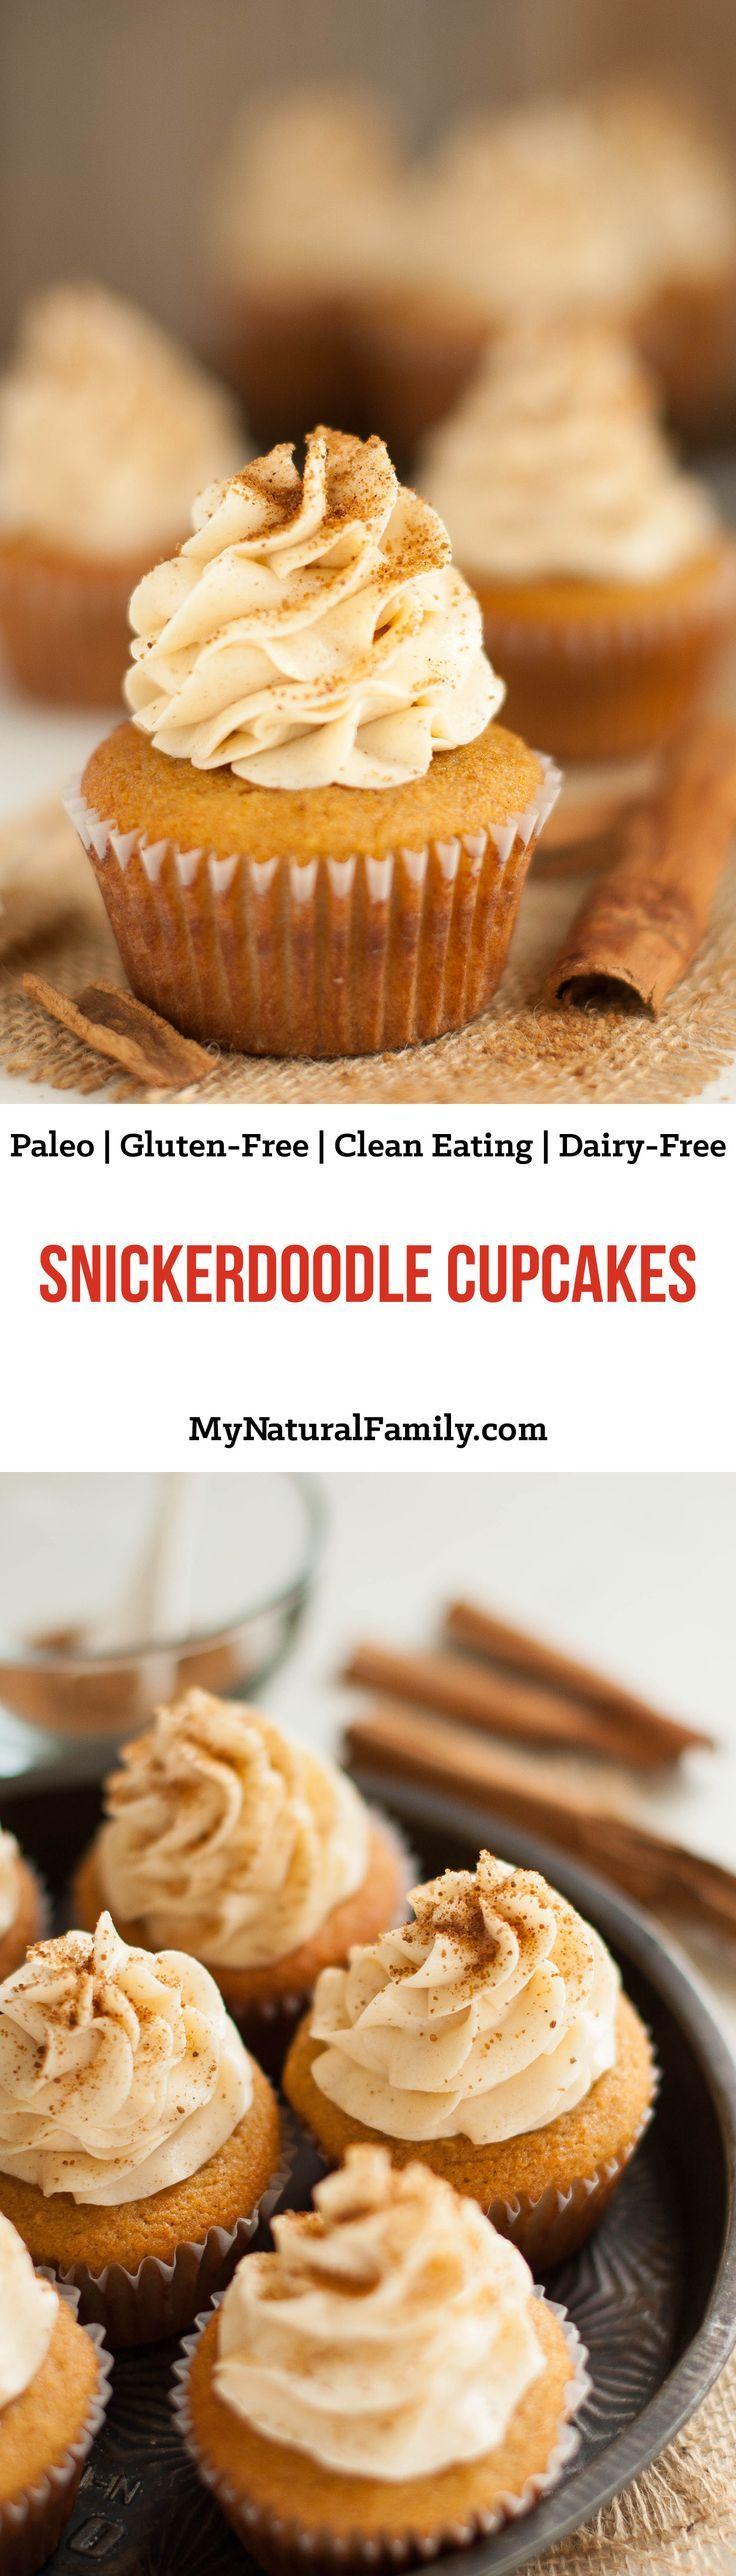 Snickerdoodle Paleo Cupcakes With Coconut Flour Recipe Dairy